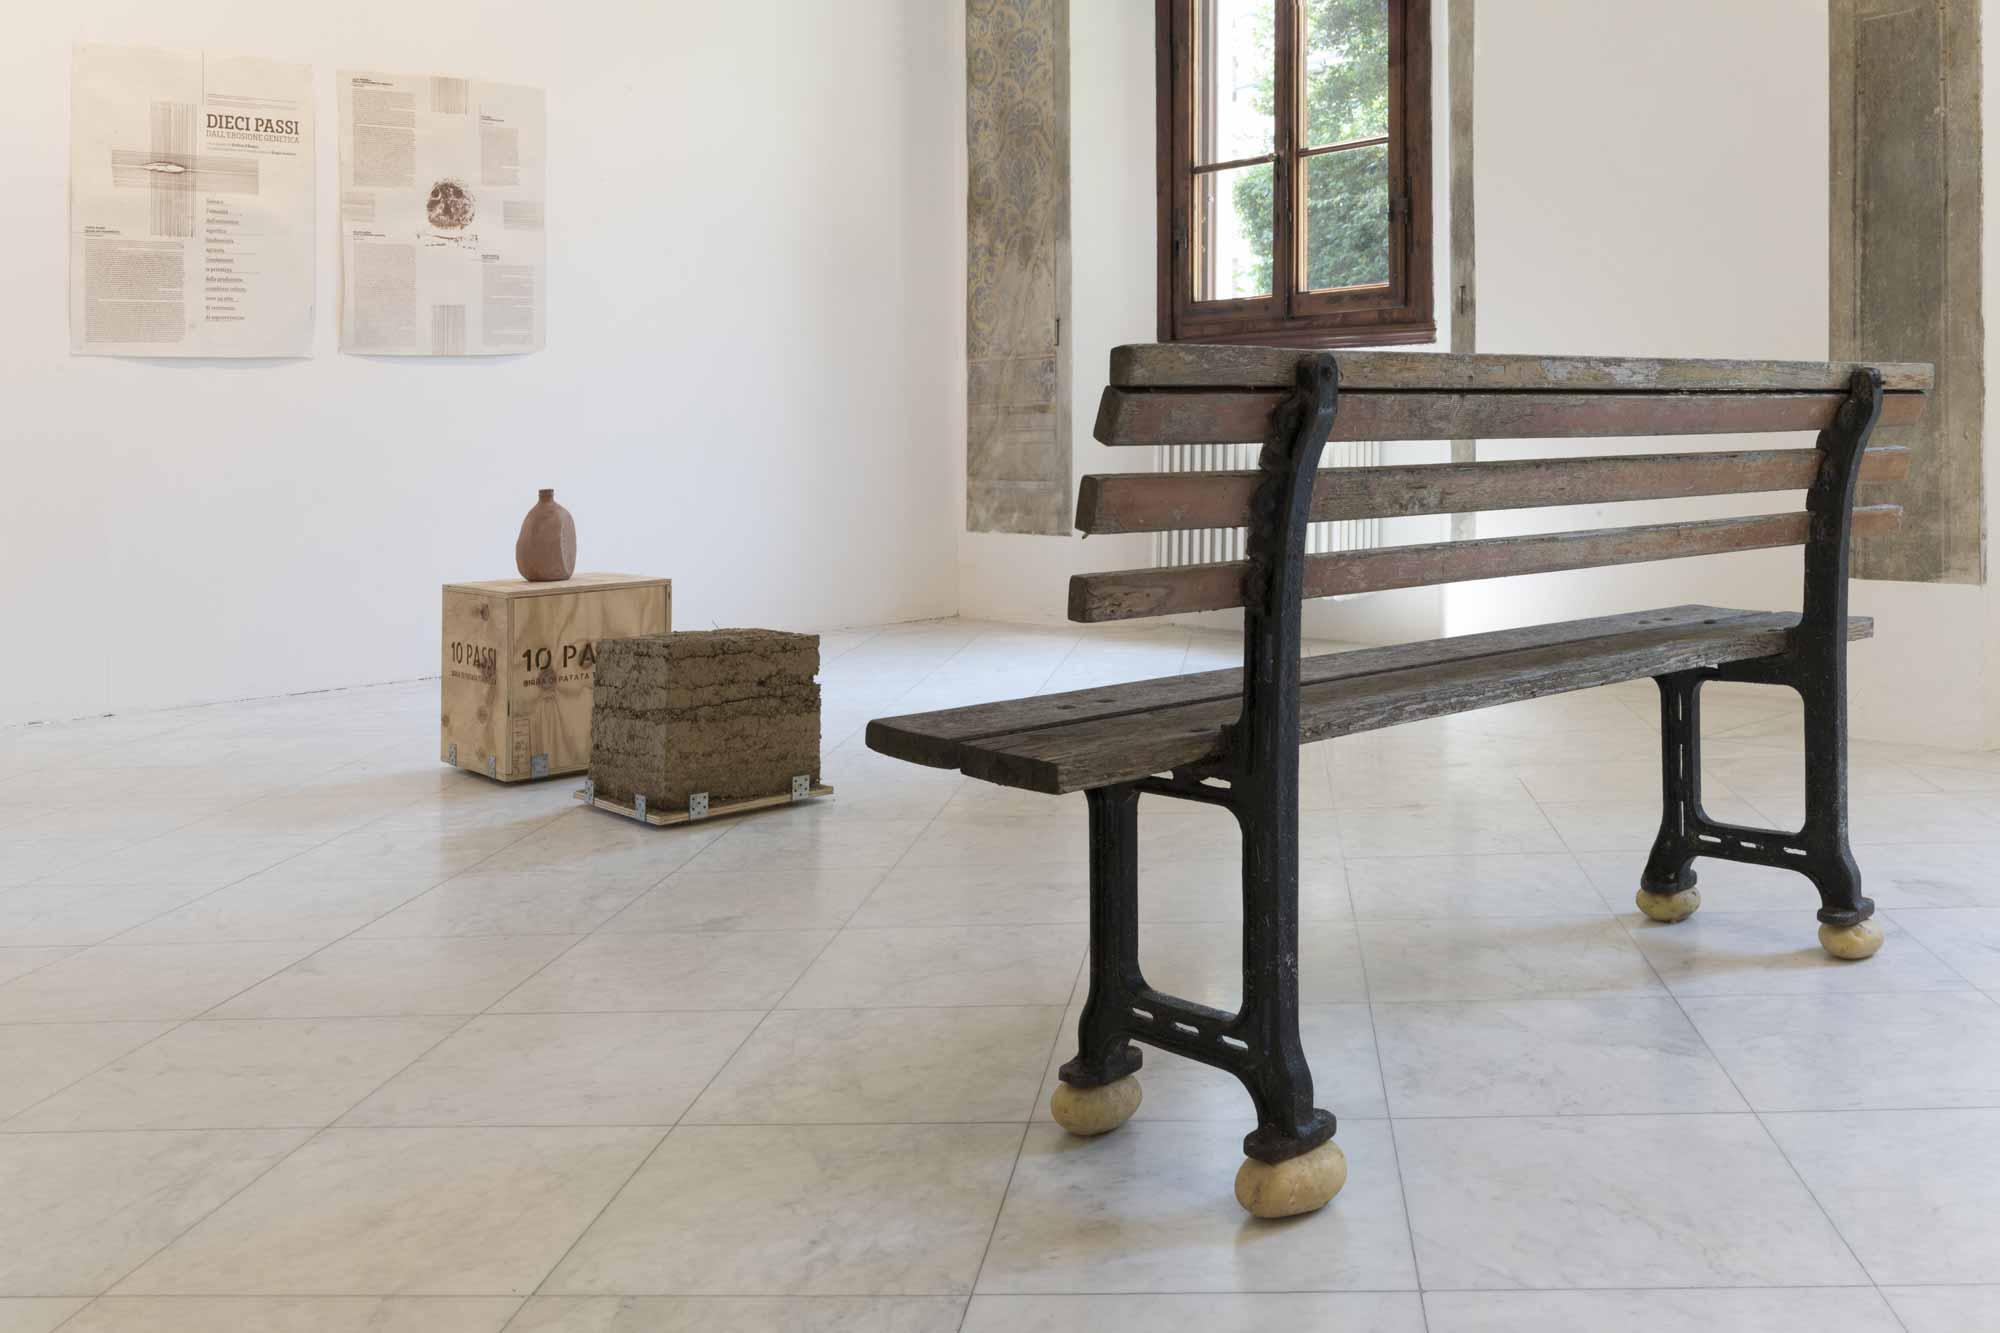 Andrea_d_Amore, <em>Ten Steps from Genetic Erosion</em>, 2017, Villa Romana, Florence; photo: OKNOstudio